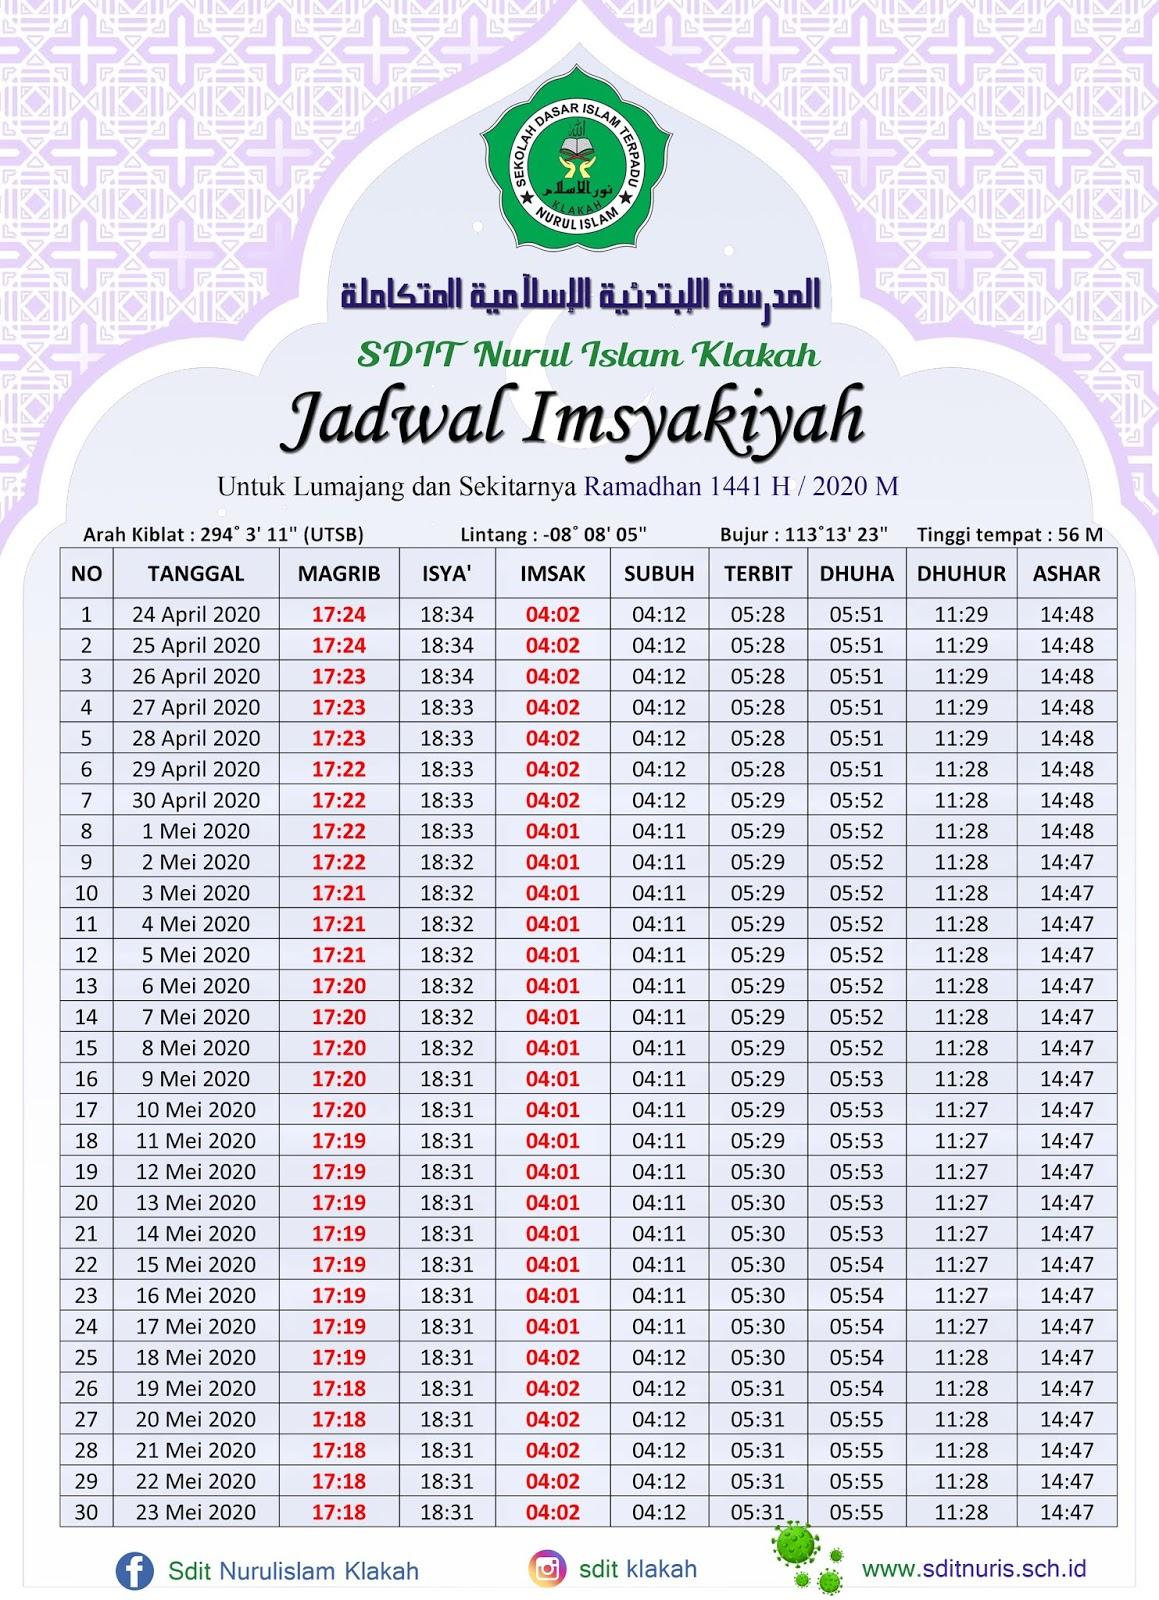 Jadwal Imsyakiyah Ramadhan 1441 H - 2020 M - SDIT NURUL ...